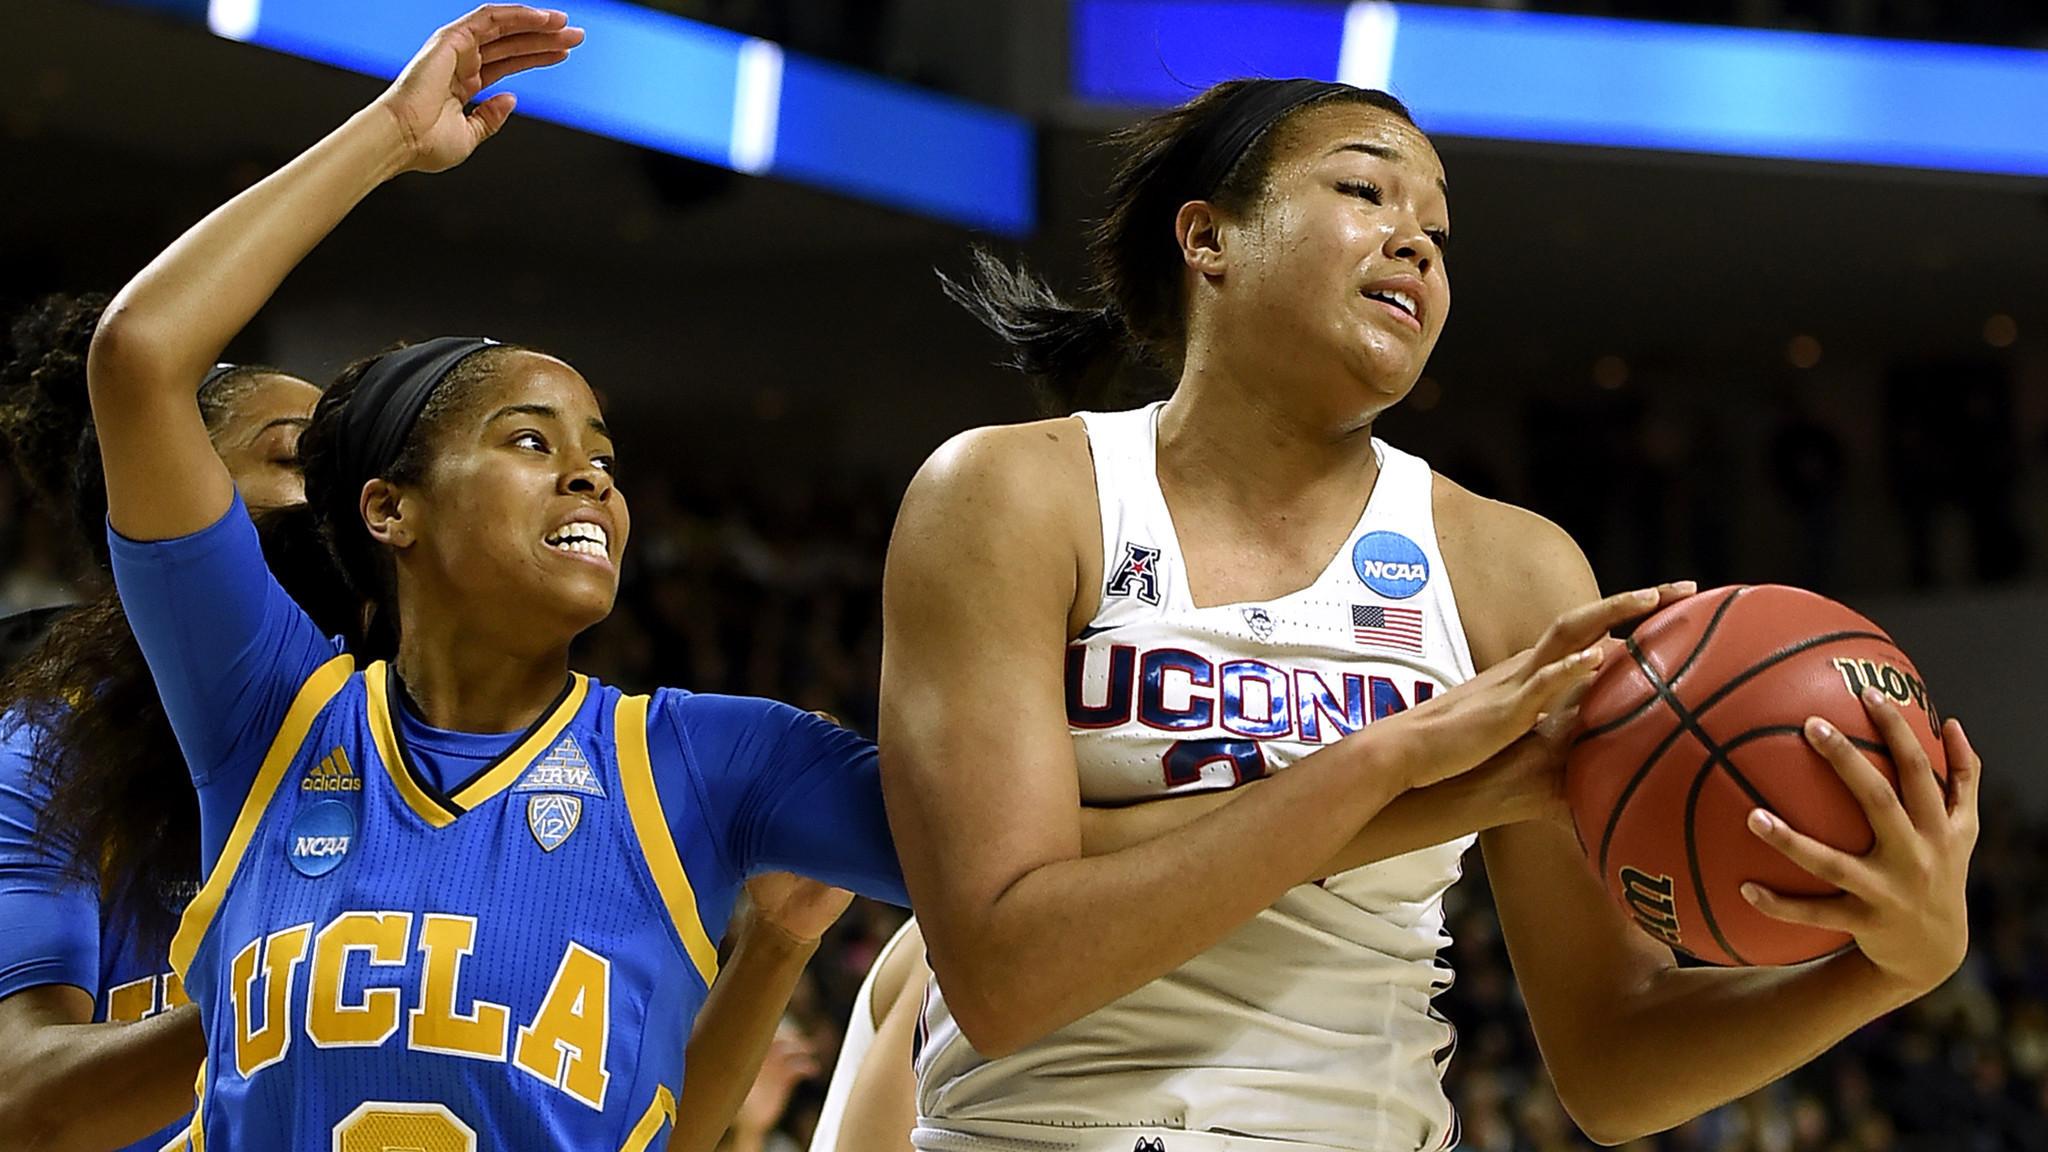 Connecticut women turn back UCLA, 86-71